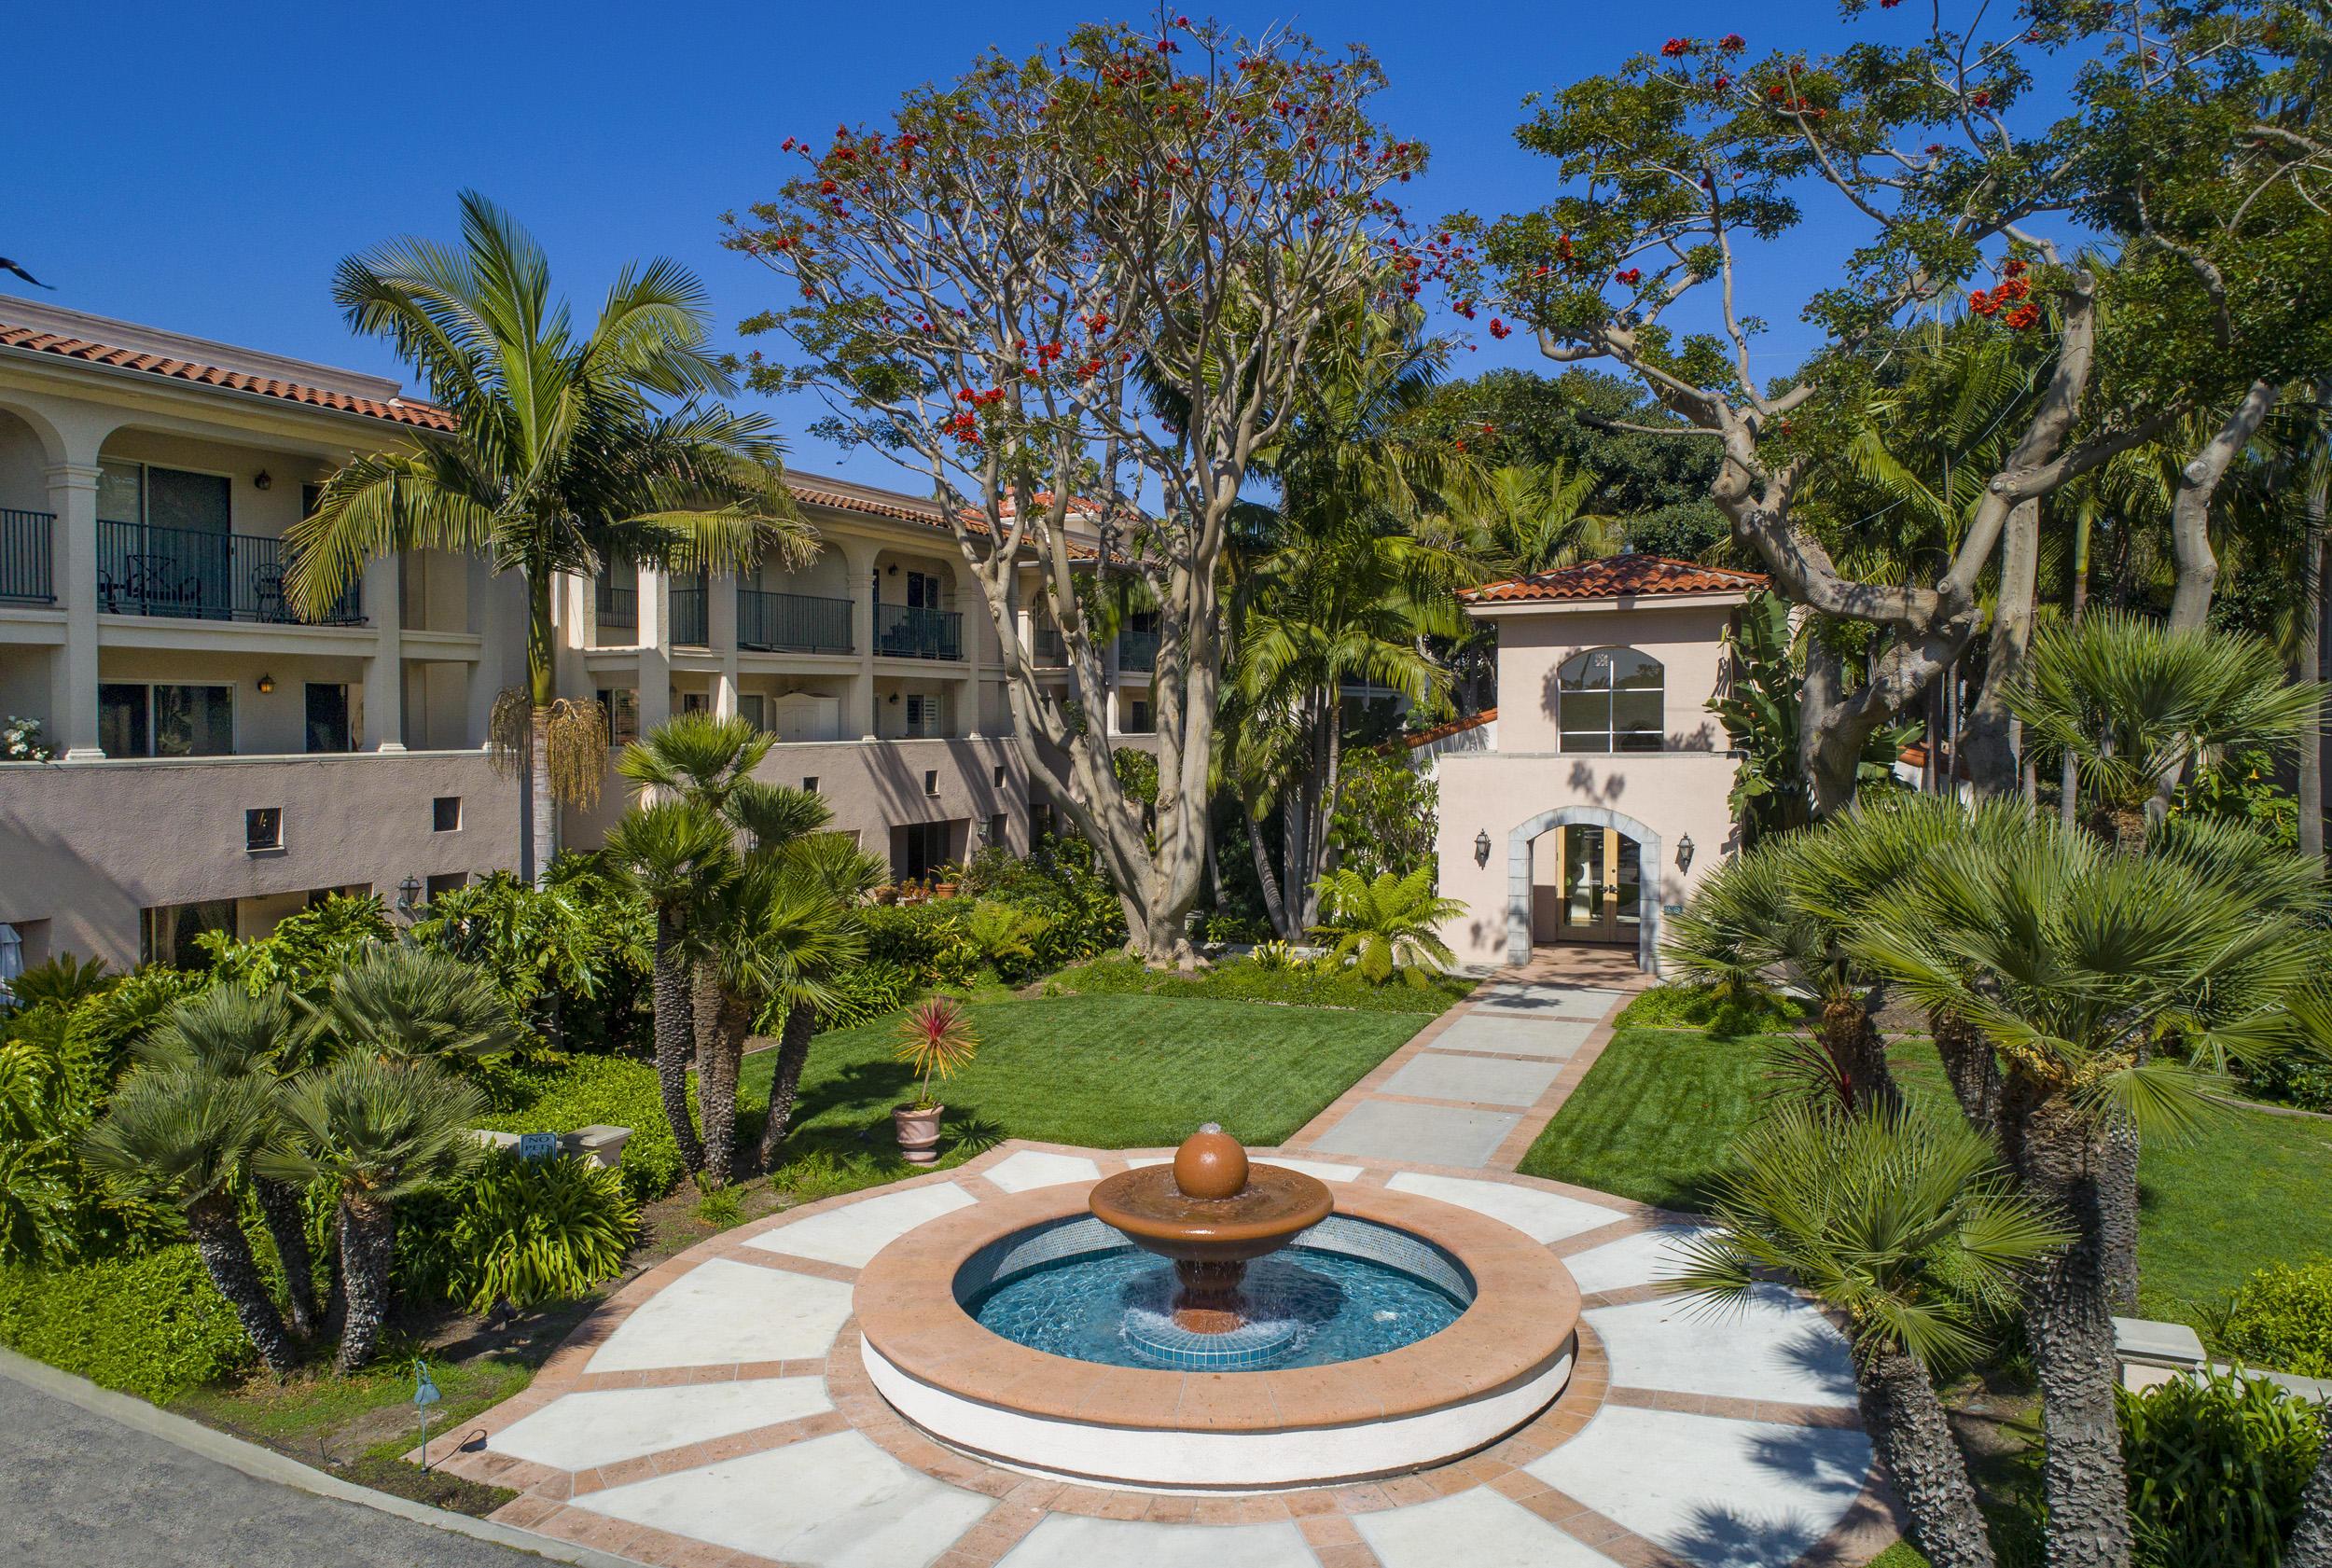 Property photo for 268 Por La Mar Cir Santa Barbara, California 93103 - 19-713